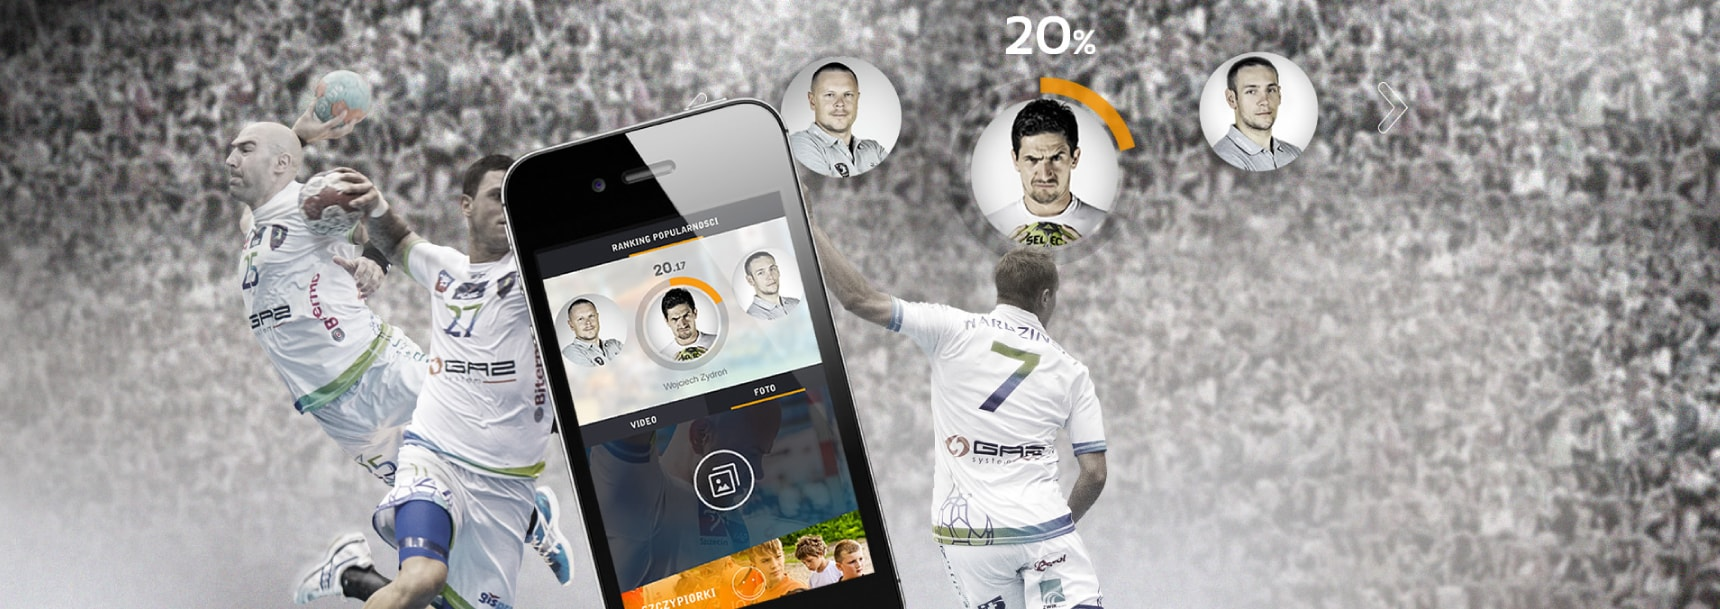 POGOŃ SZCZECIN Handball - Silni Razem PGNiG Superliga